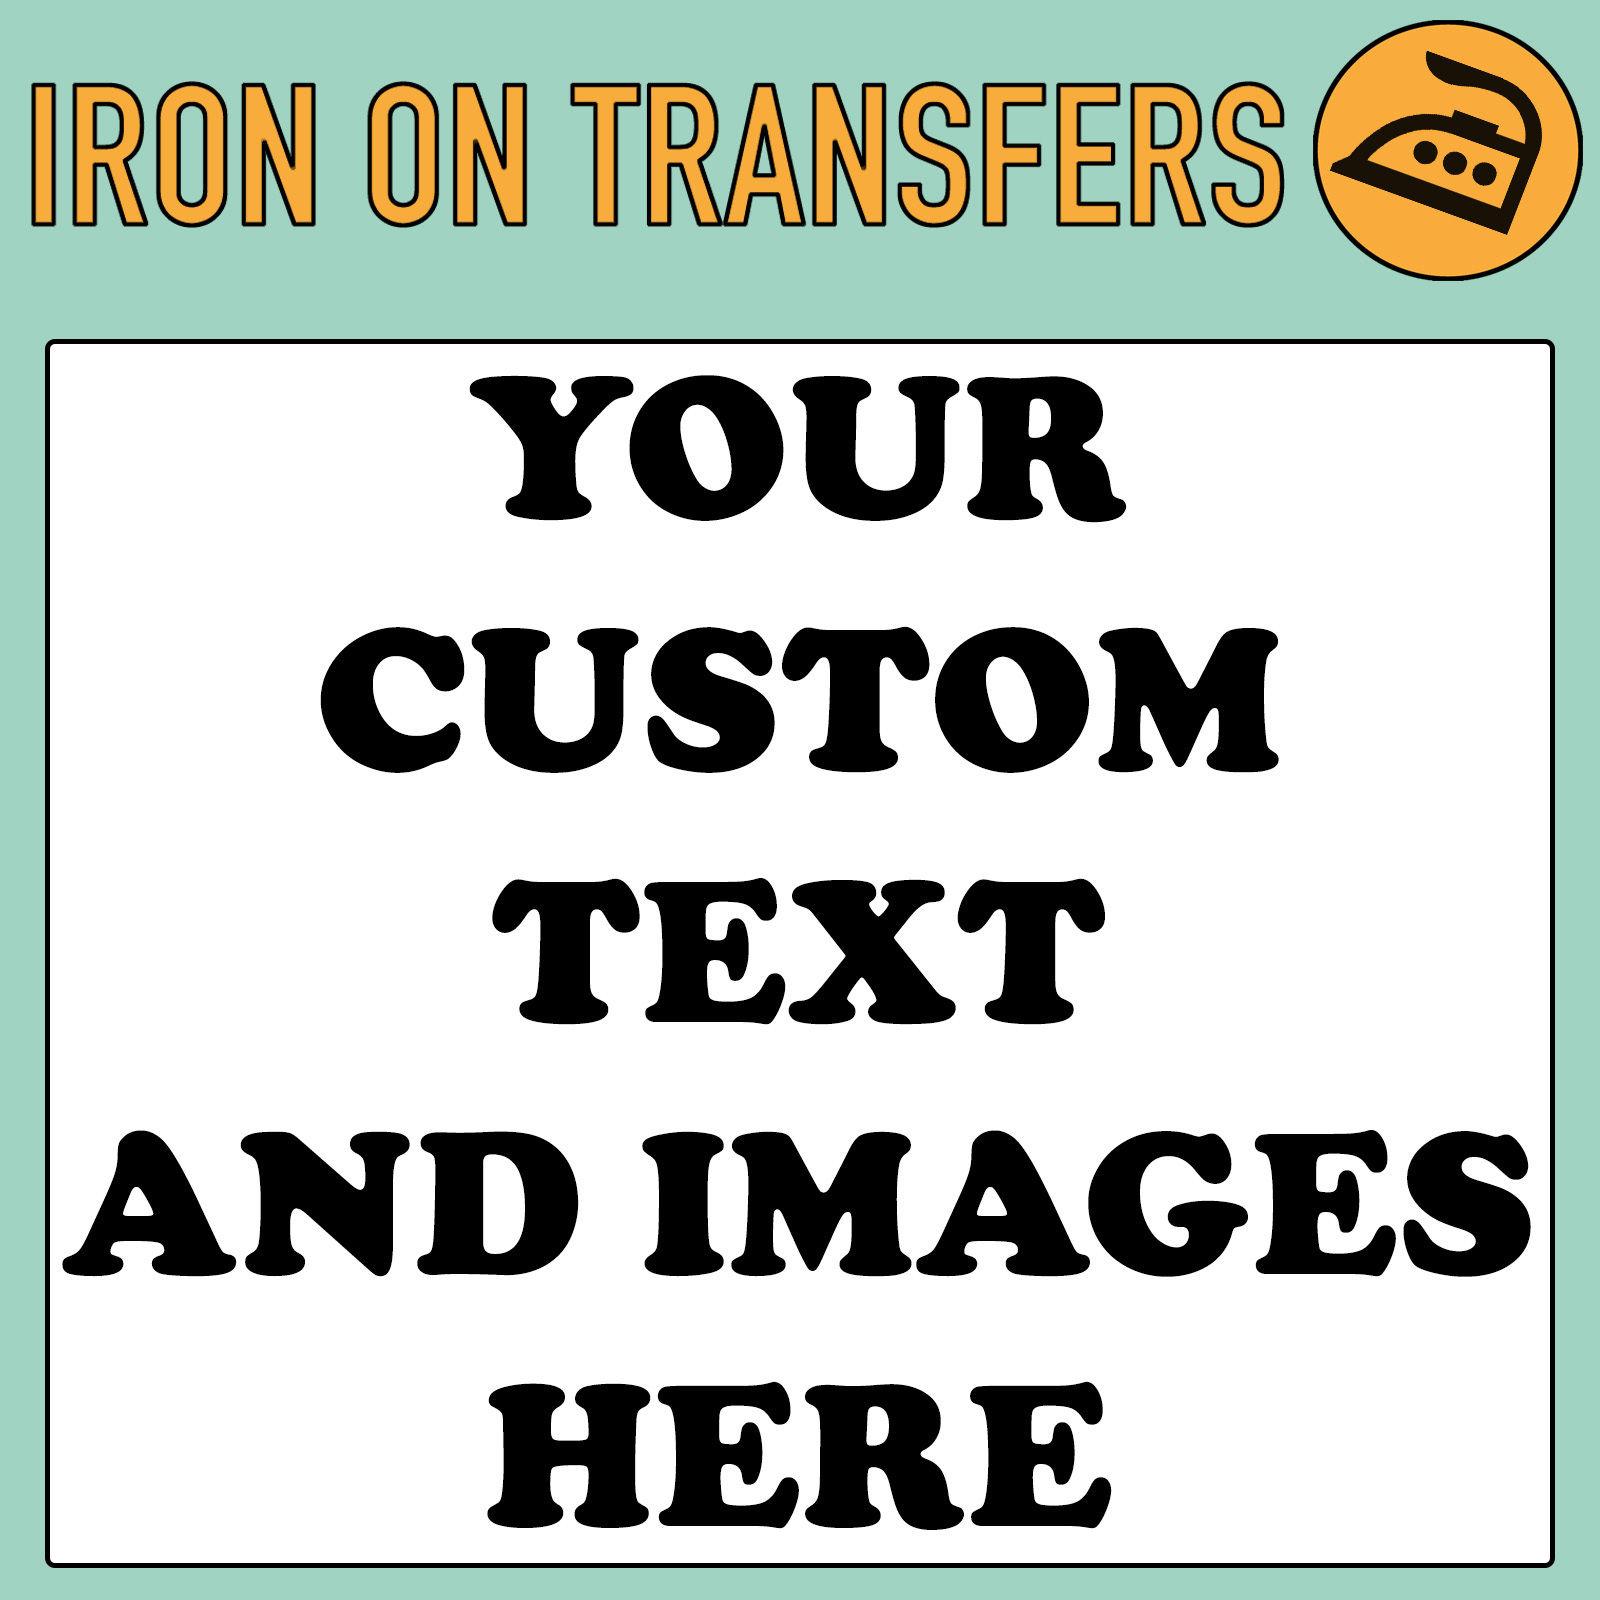 Custom iron on t shirt transfer personalised text quality prints custom iron on t shirt transfer personalised text quality prints your name image biocorpaavc